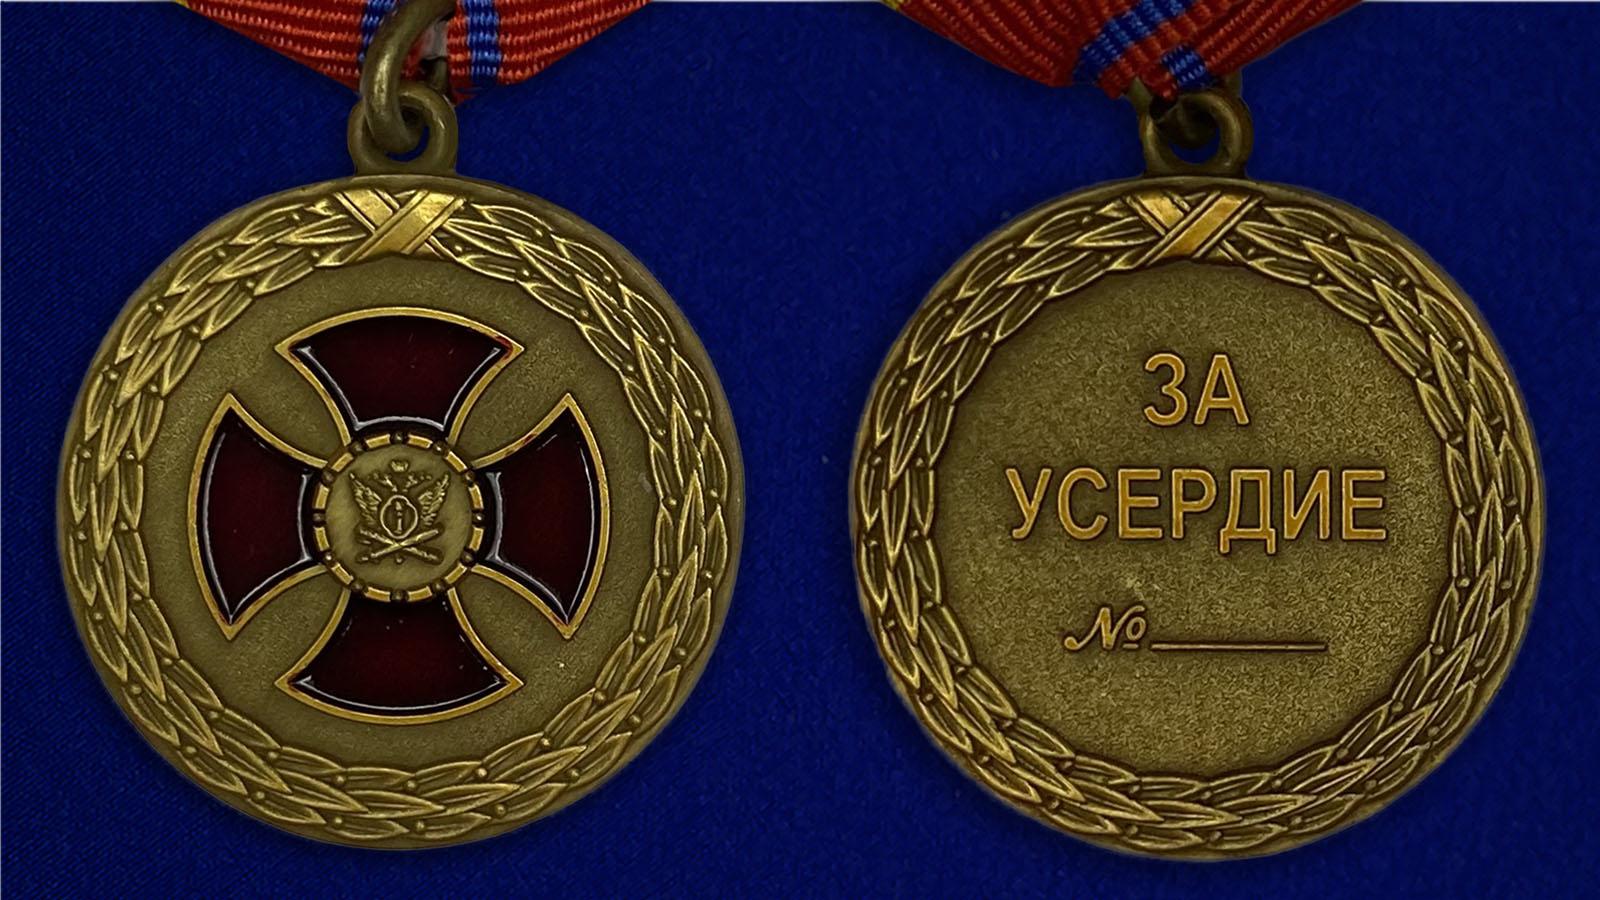 Медаль Министерства Юстиции За усердие 1 степени - аверс и реверс